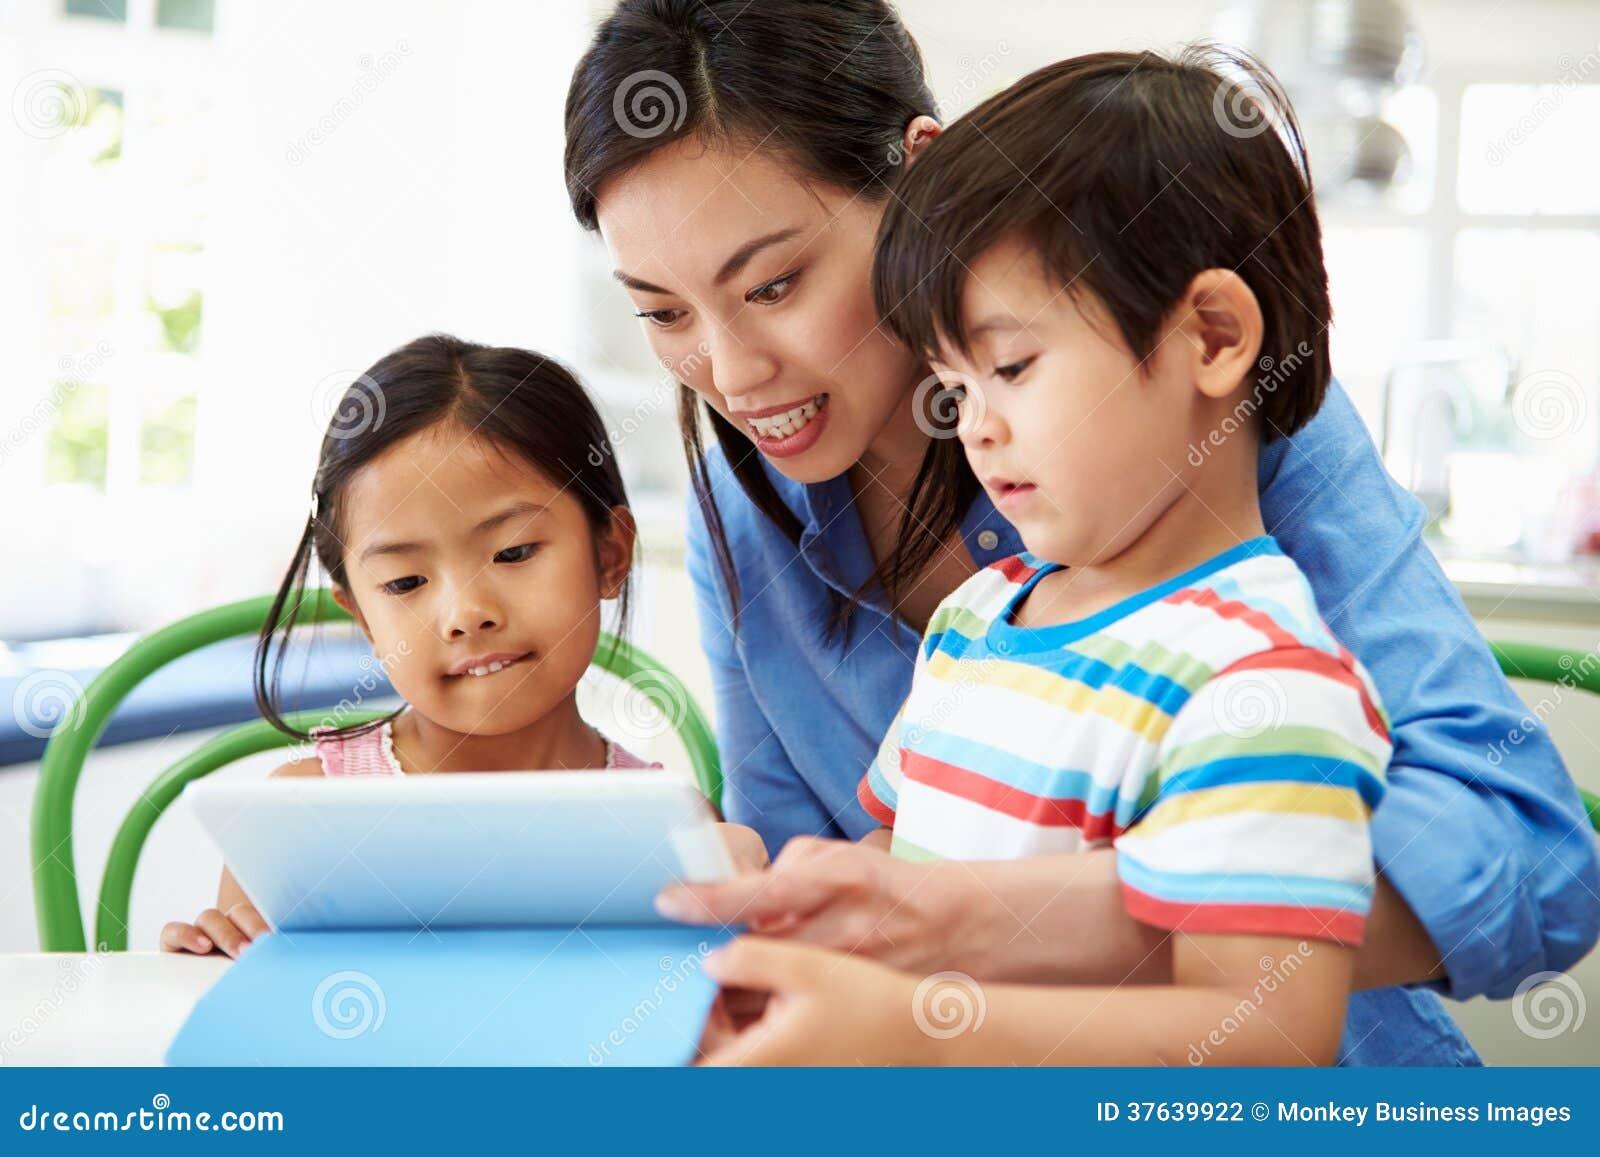 Mother Helping Children With Homework Using Digital Tablet